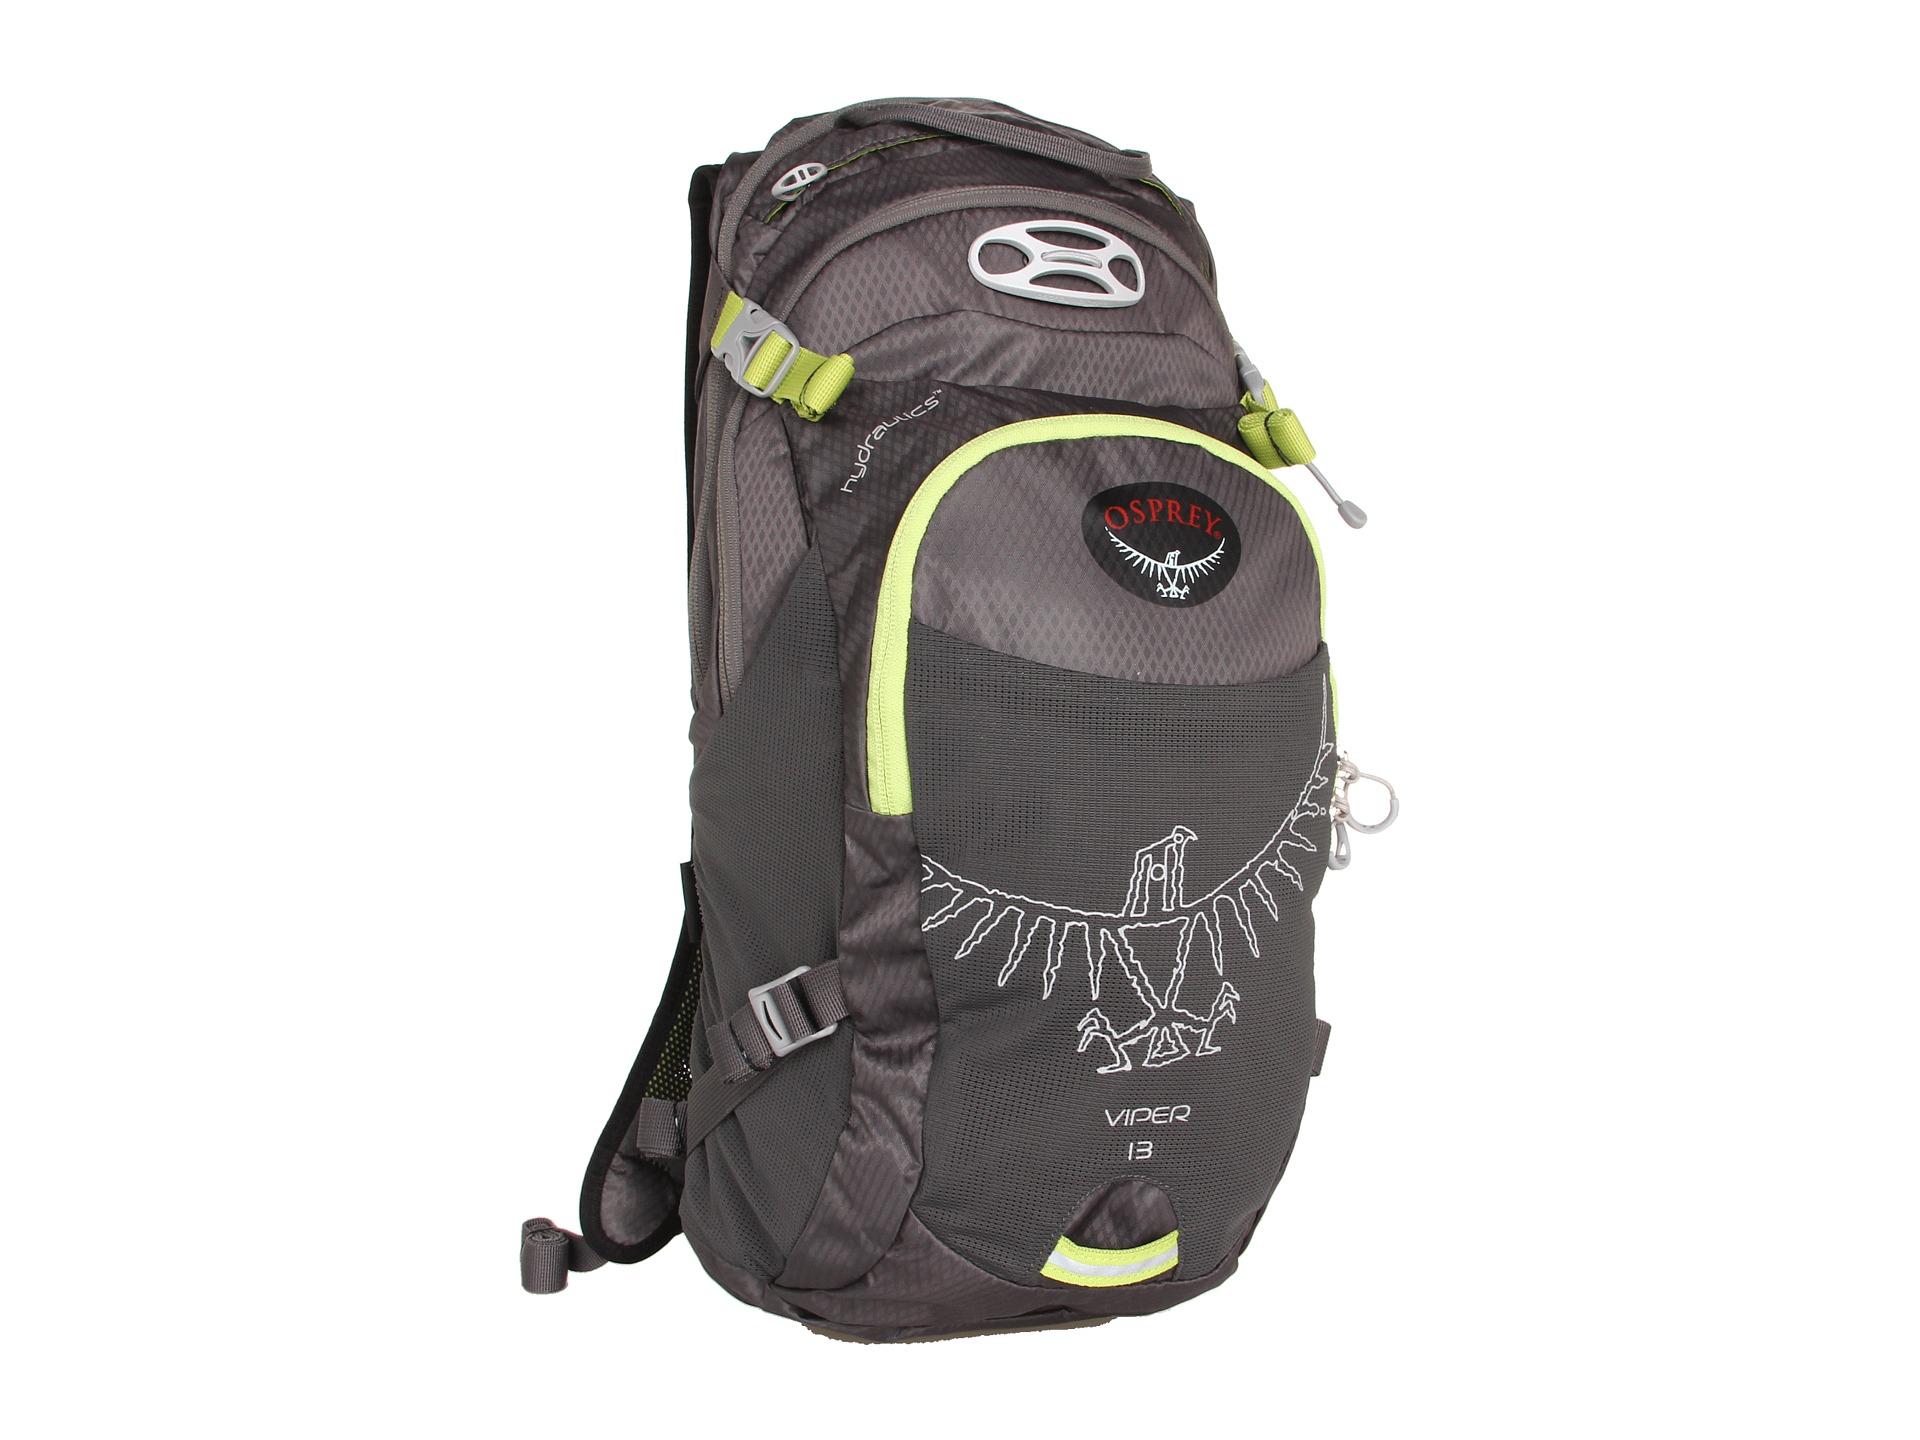 Osprey Viper 13 Zappos Com Free Shipping Both Ways